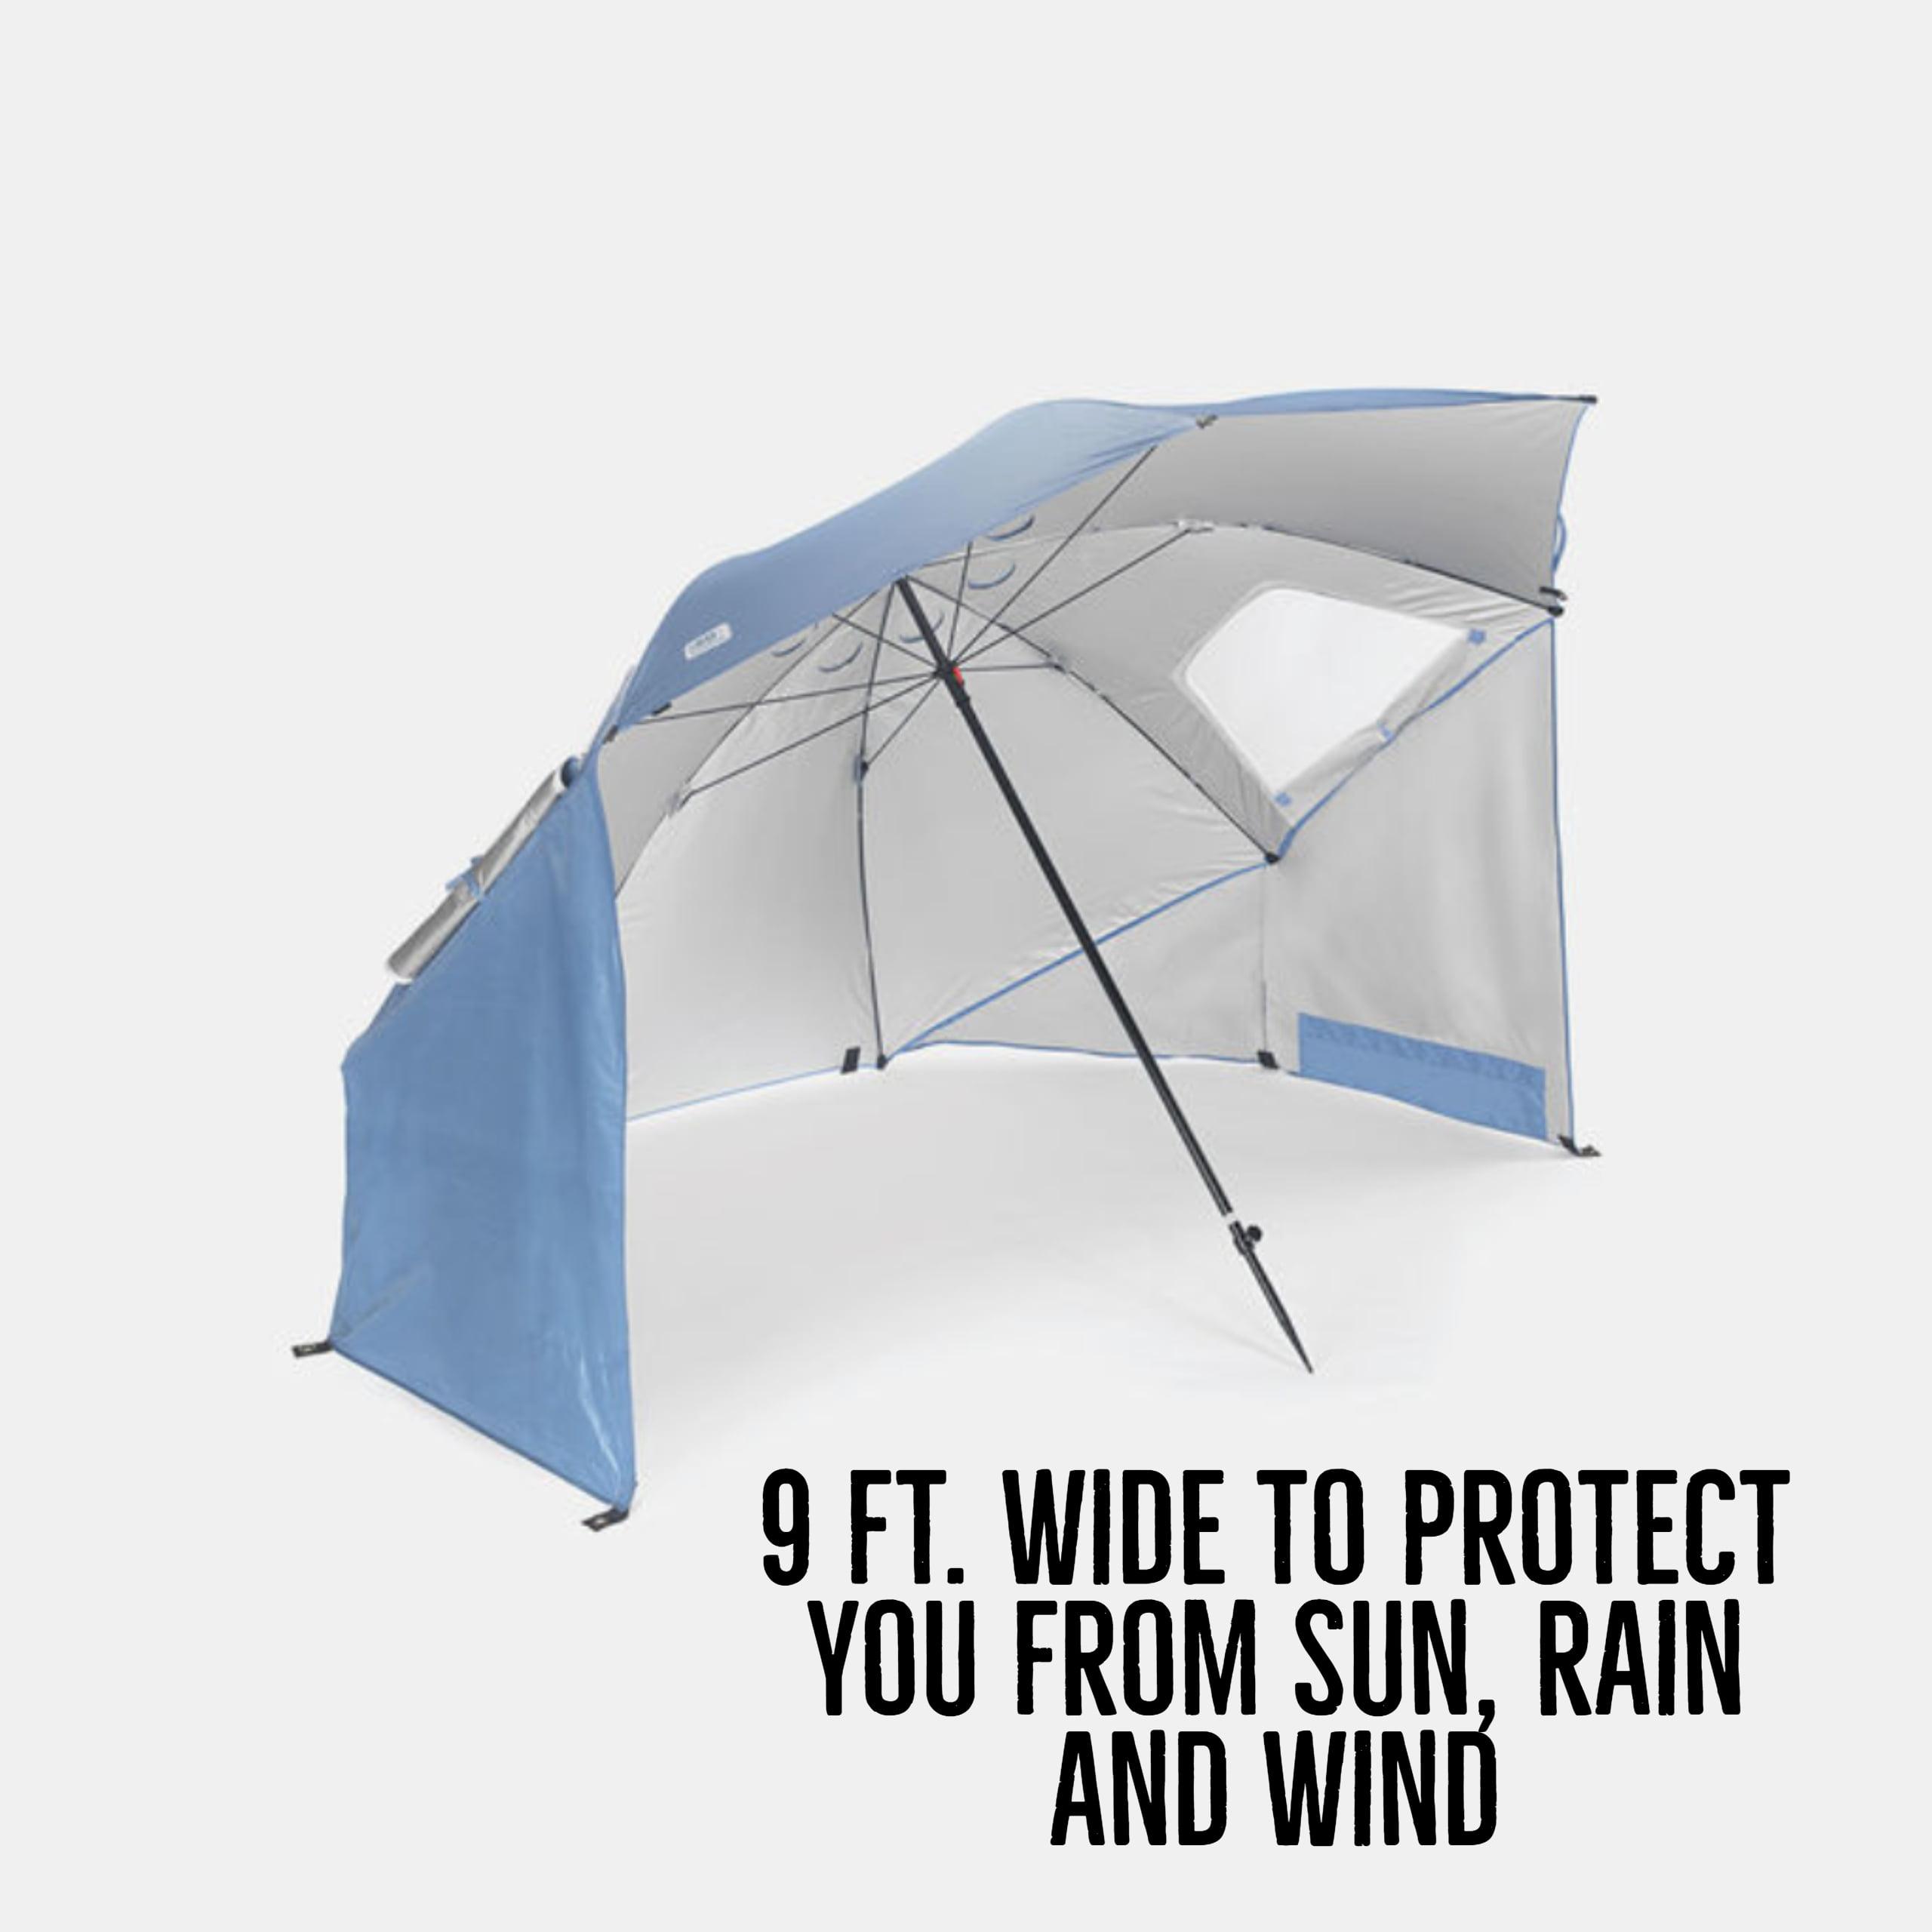 Sport-Brella XL Umbrella Portable Canopy, Steel Blue by SKLZ